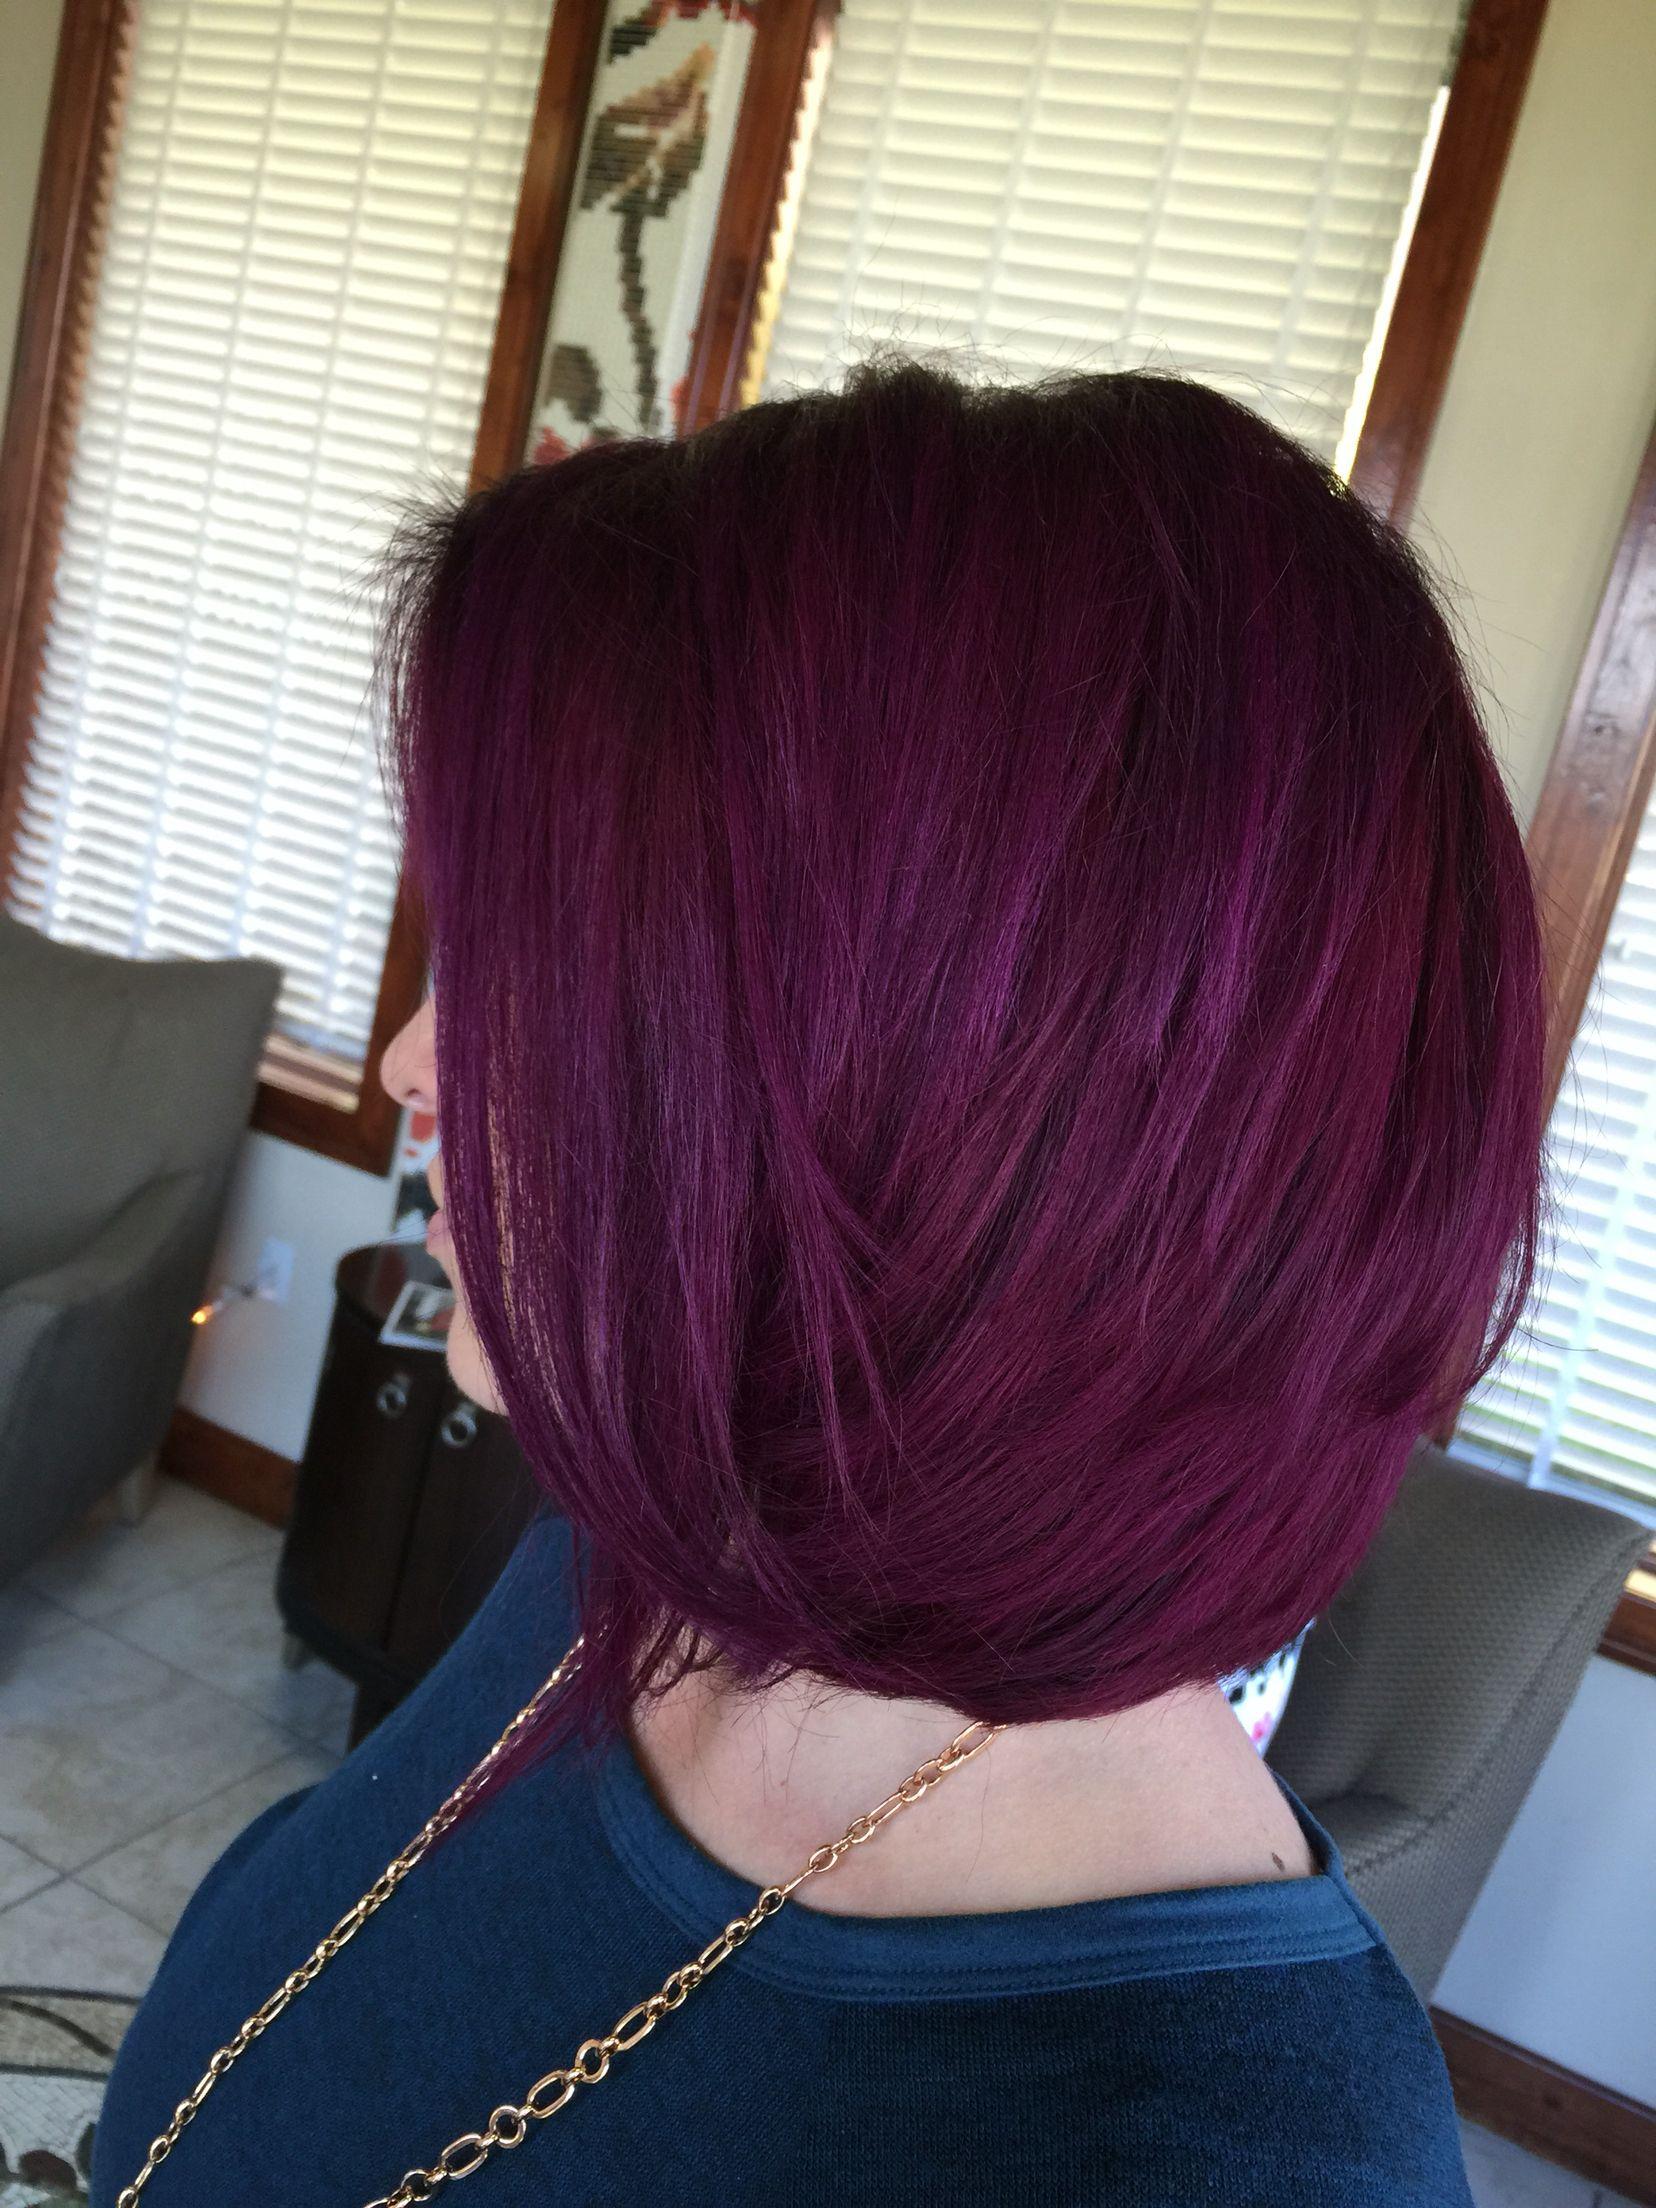 Igora Royal Permanent Hair Color 6 99 Roots Half 6 99 Half 9 98 Mid Shaft To Ends Enjoy